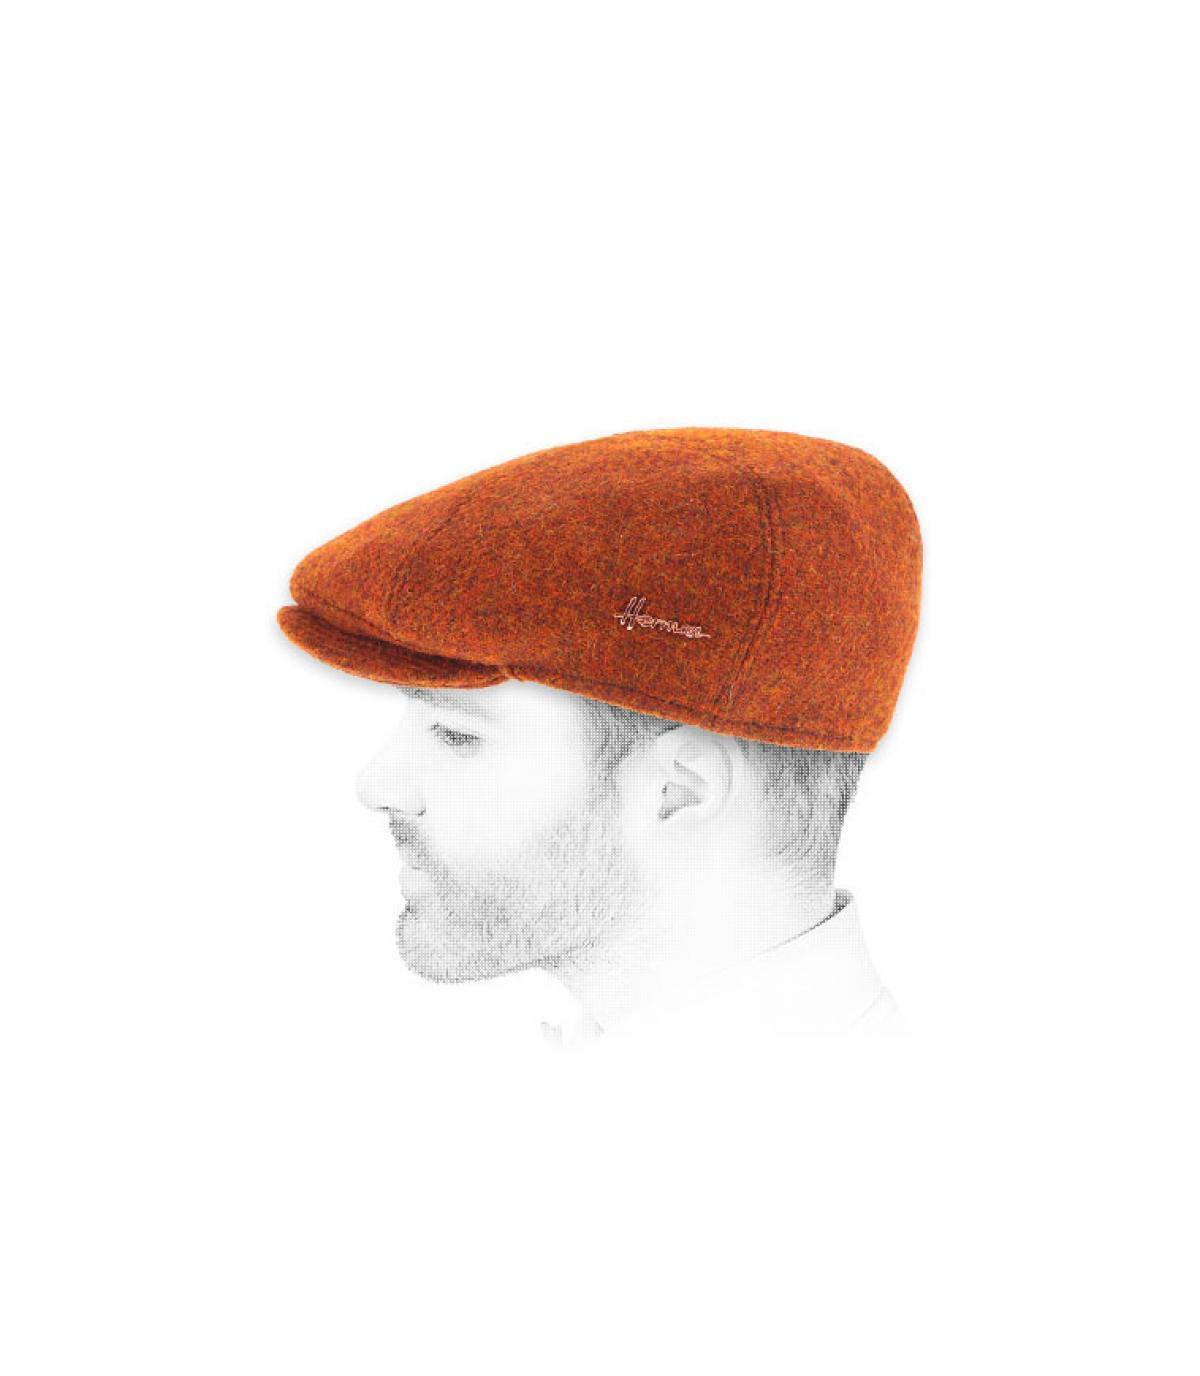 orange tweed flat cap Herman